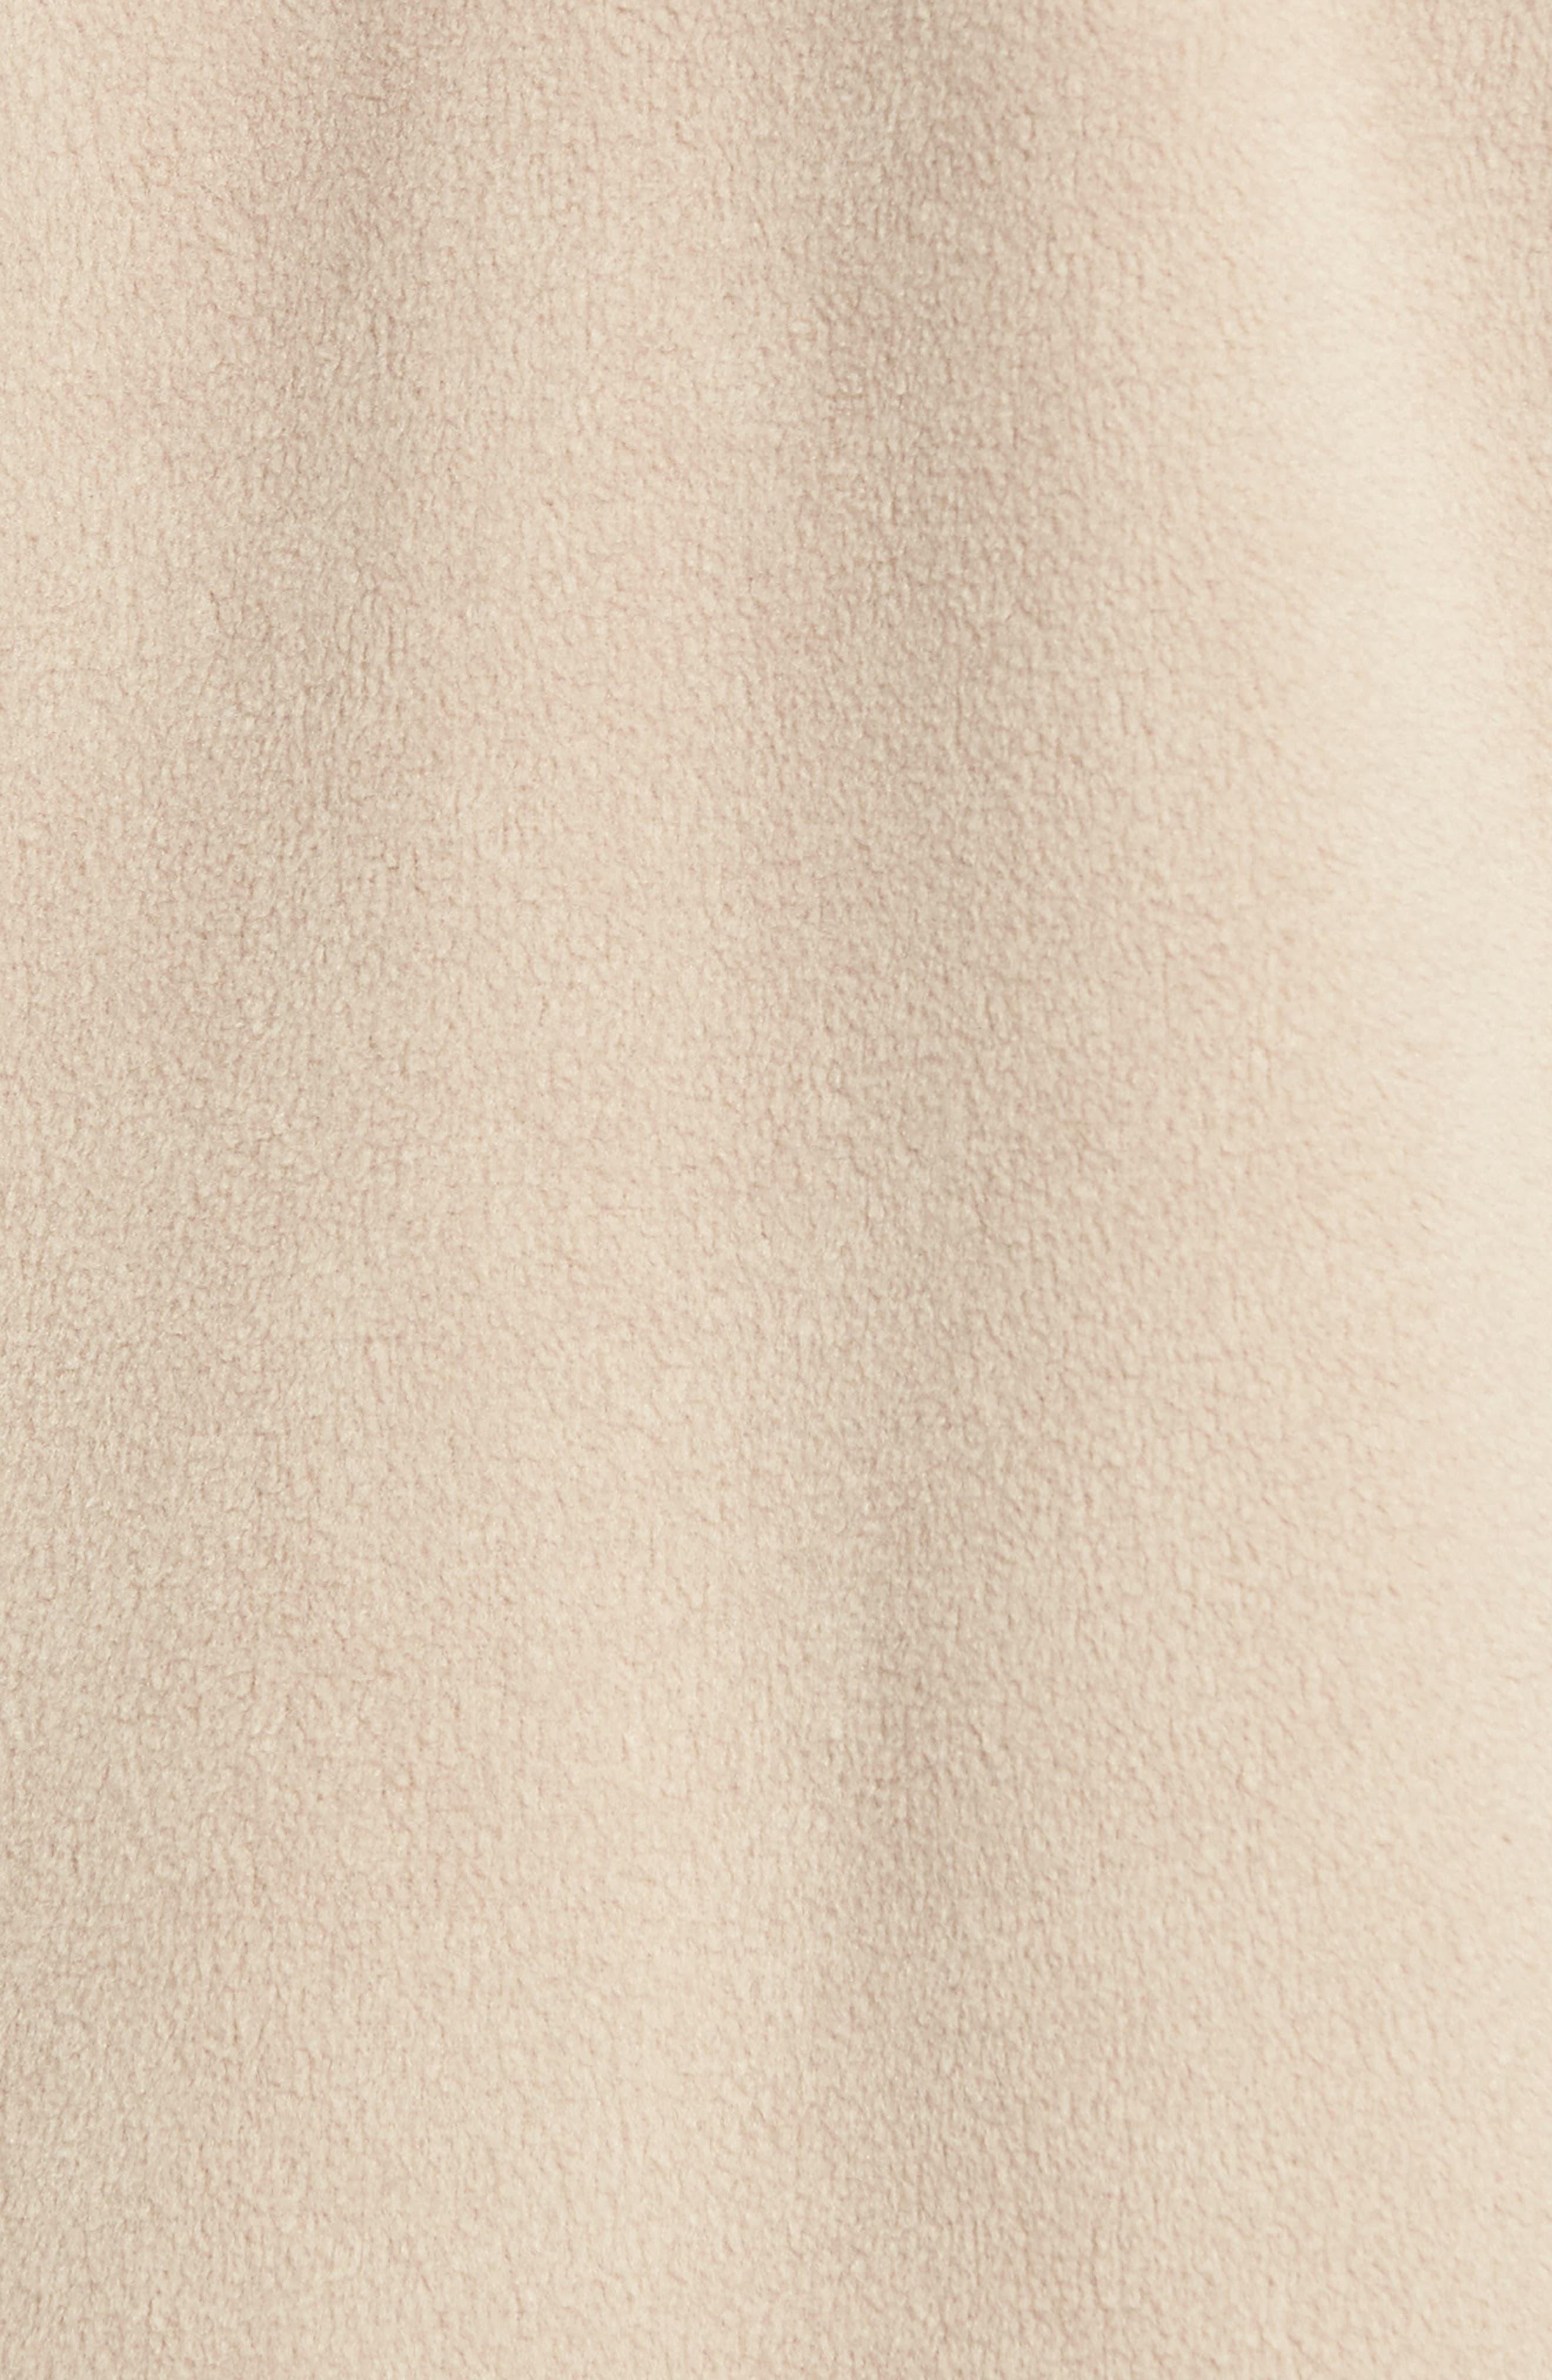 Bonded Polar Fleece Lined Pullover,                             Alternate thumbnail 5, color,                             249